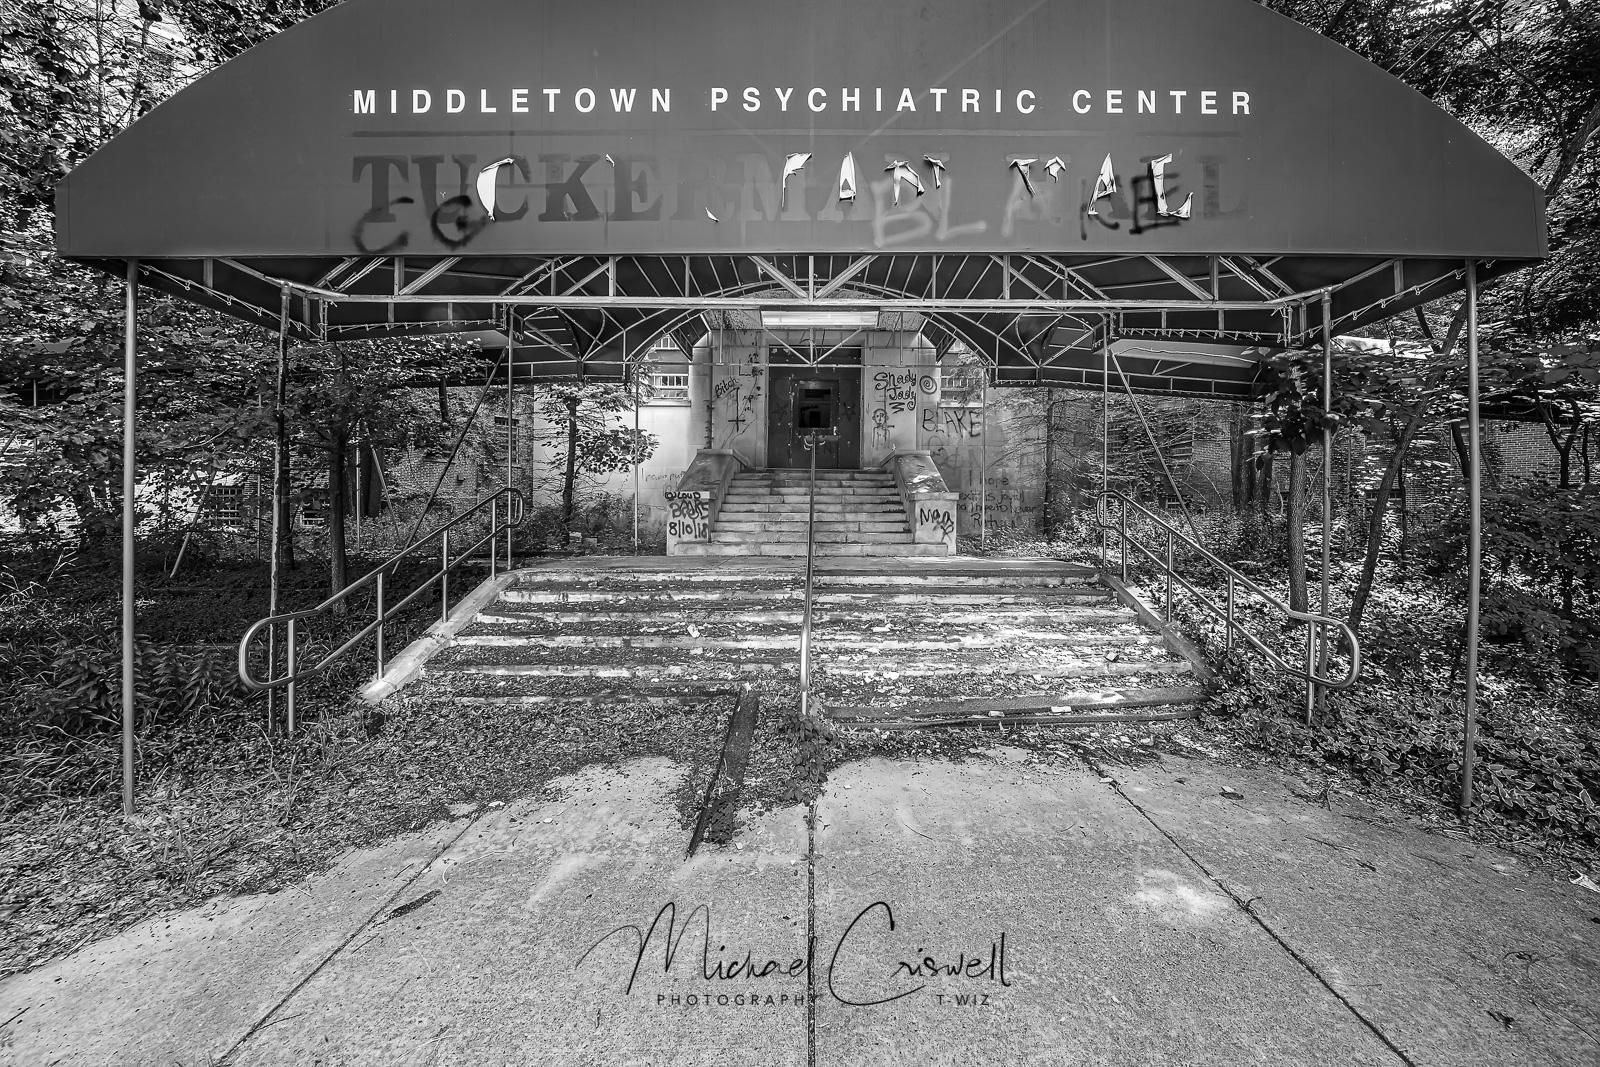 13-2020-Middletown-Psyciatric